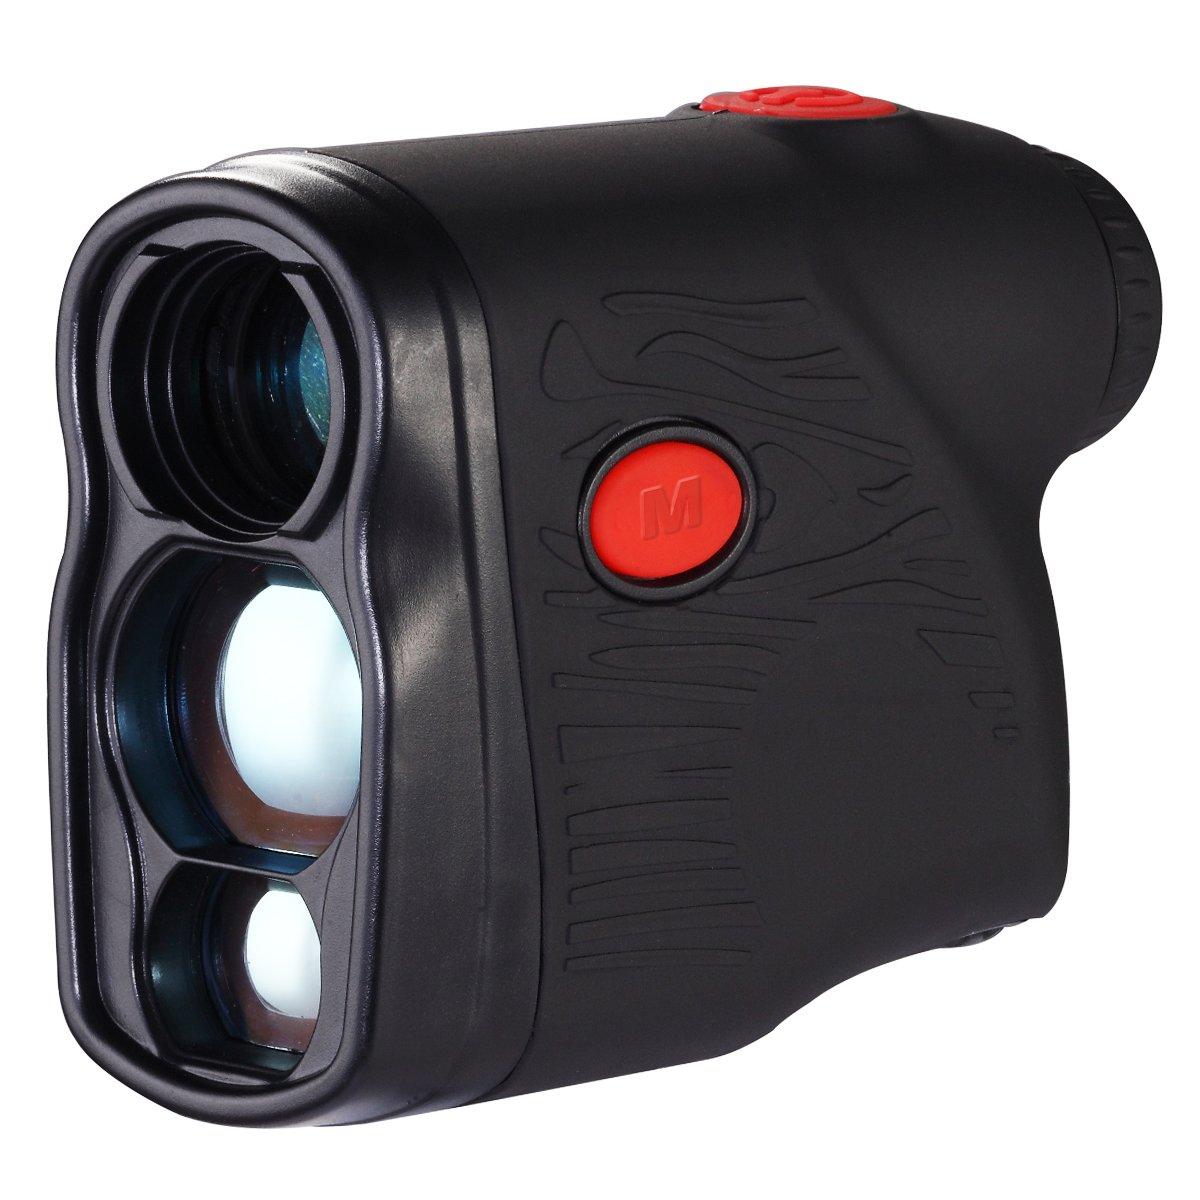 LaserWorks Distance Yards Hunting Rangefinder